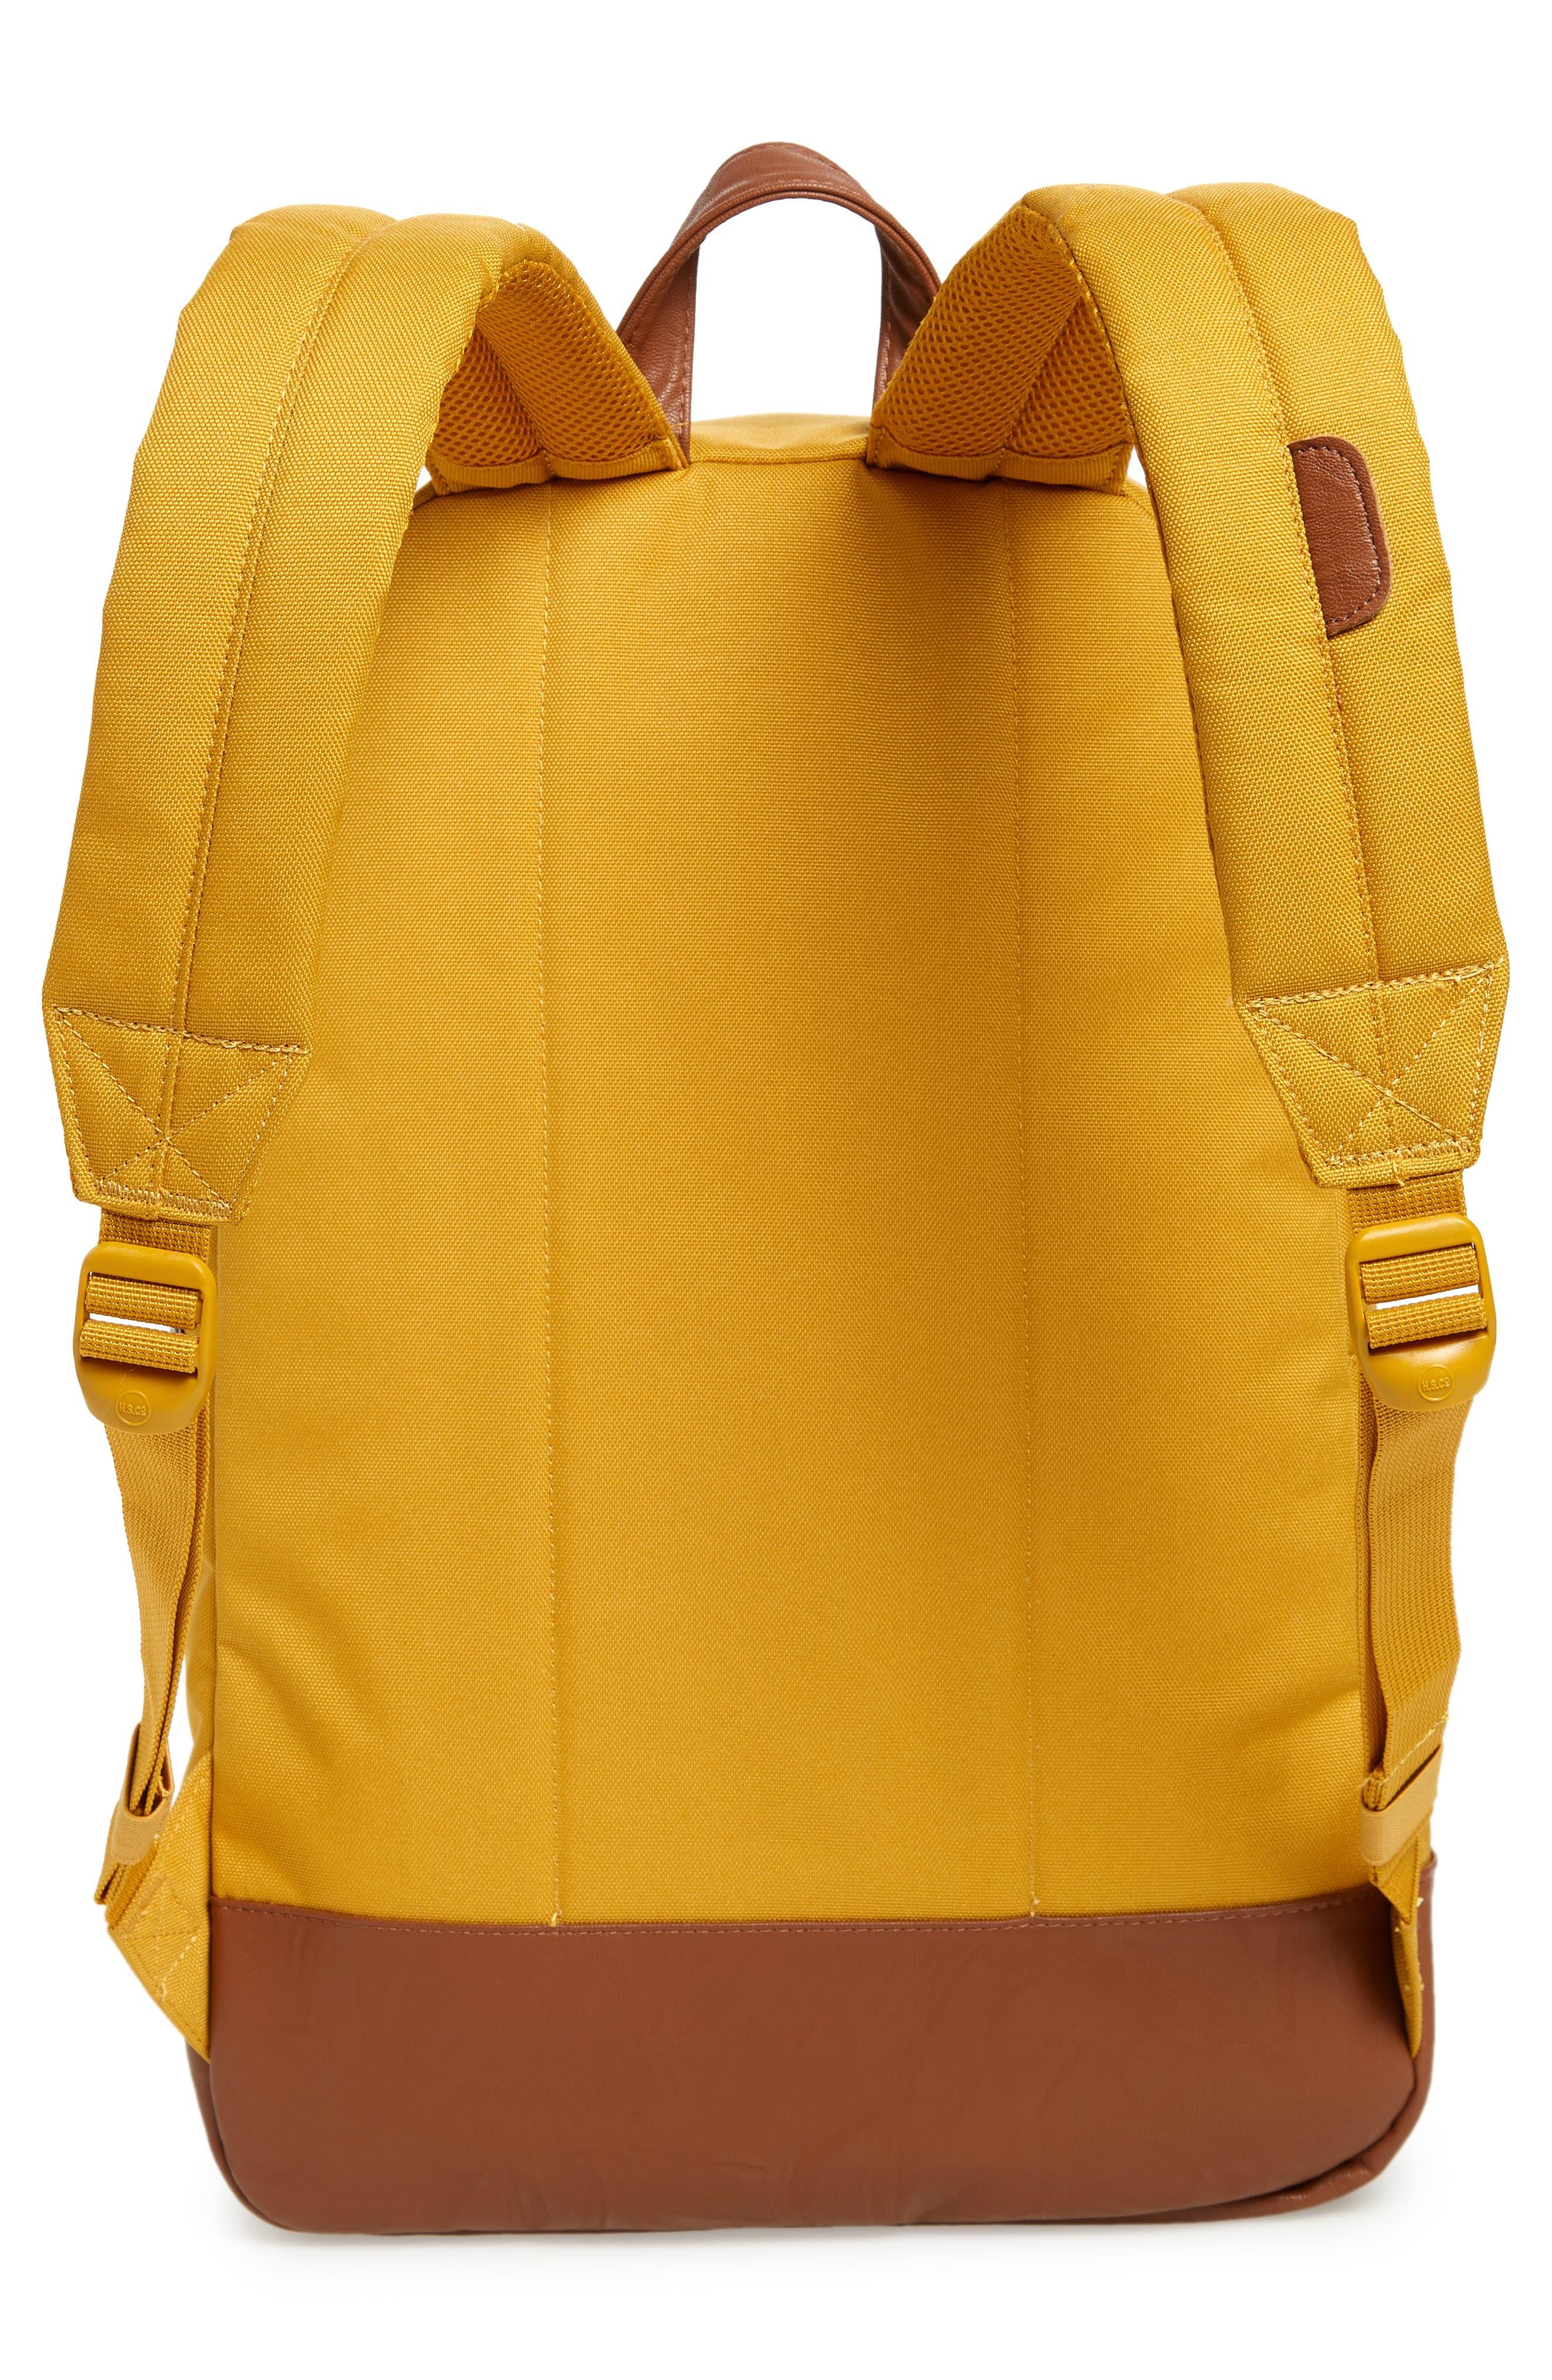 Heritage Backpack,                             Alternate thumbnail 3, color,                             ARROW WOOD